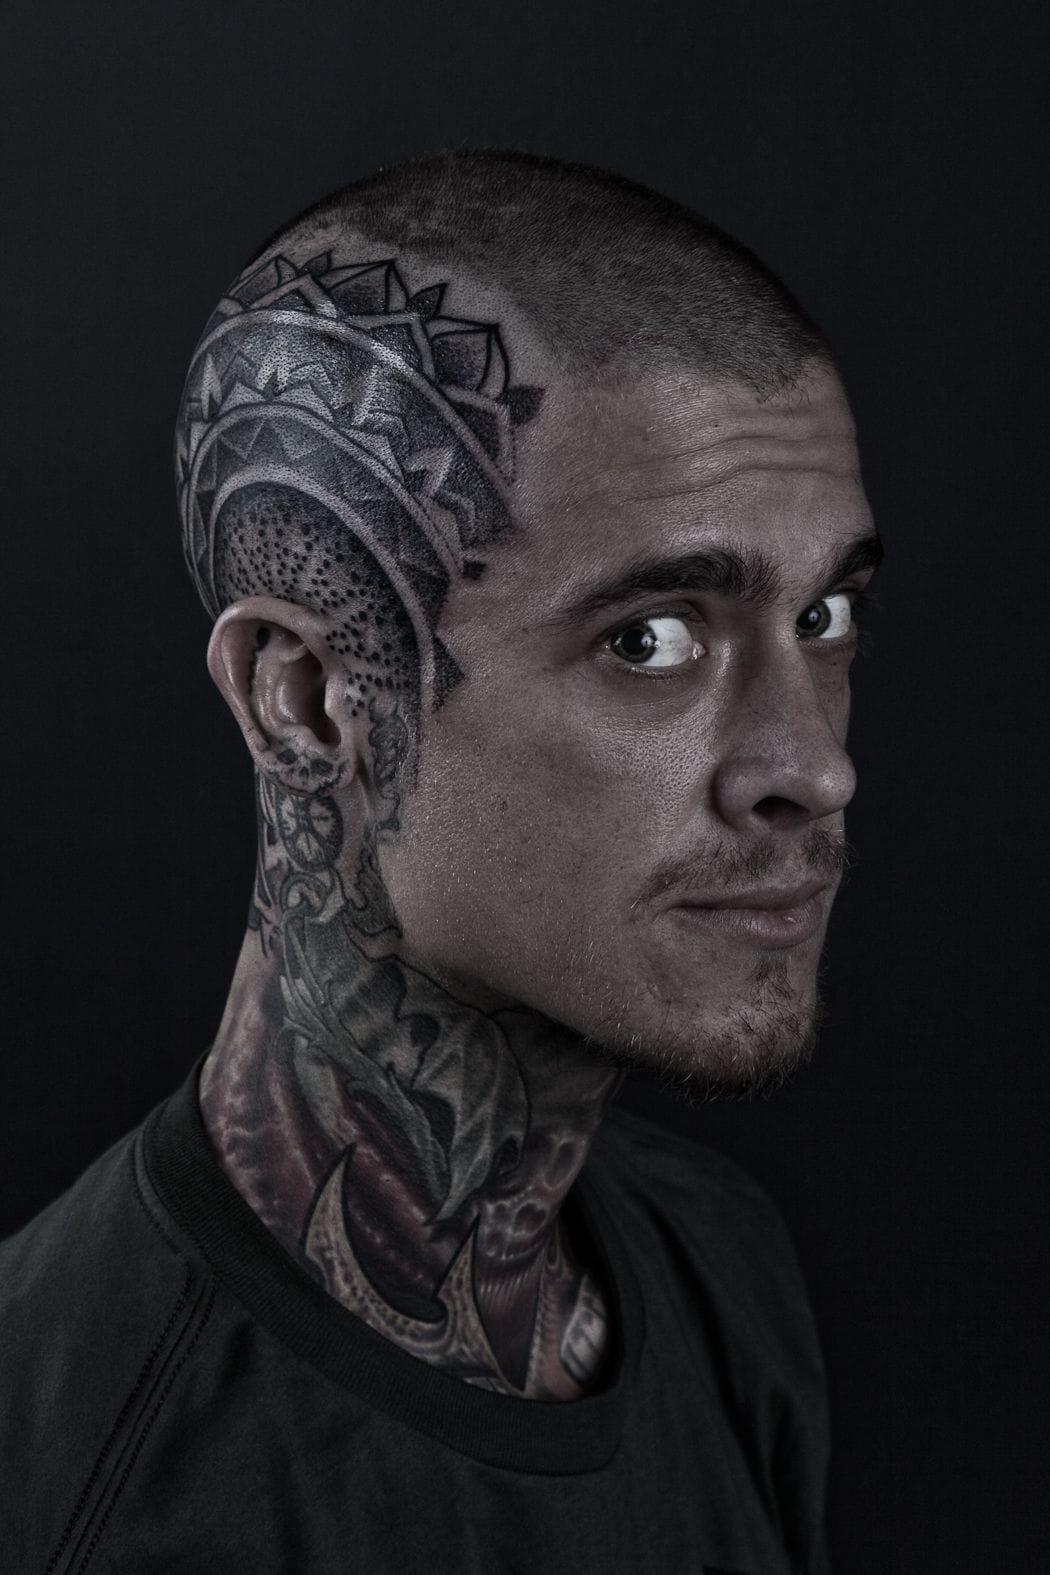 Here is tattoo artist Nathan Kostechko, tattooed by Hooper.